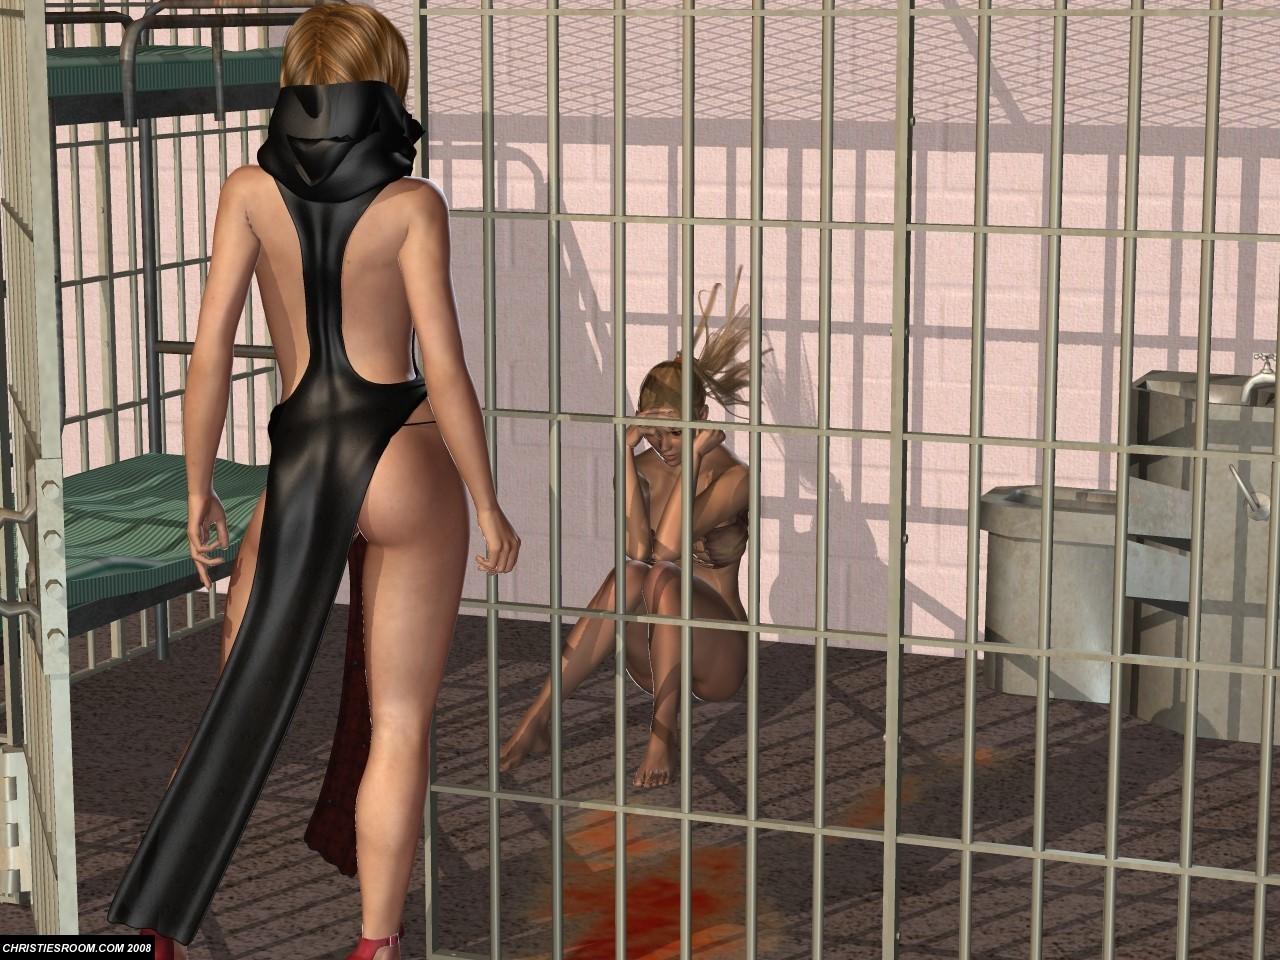 Секс в онлайн играх 16 фотография